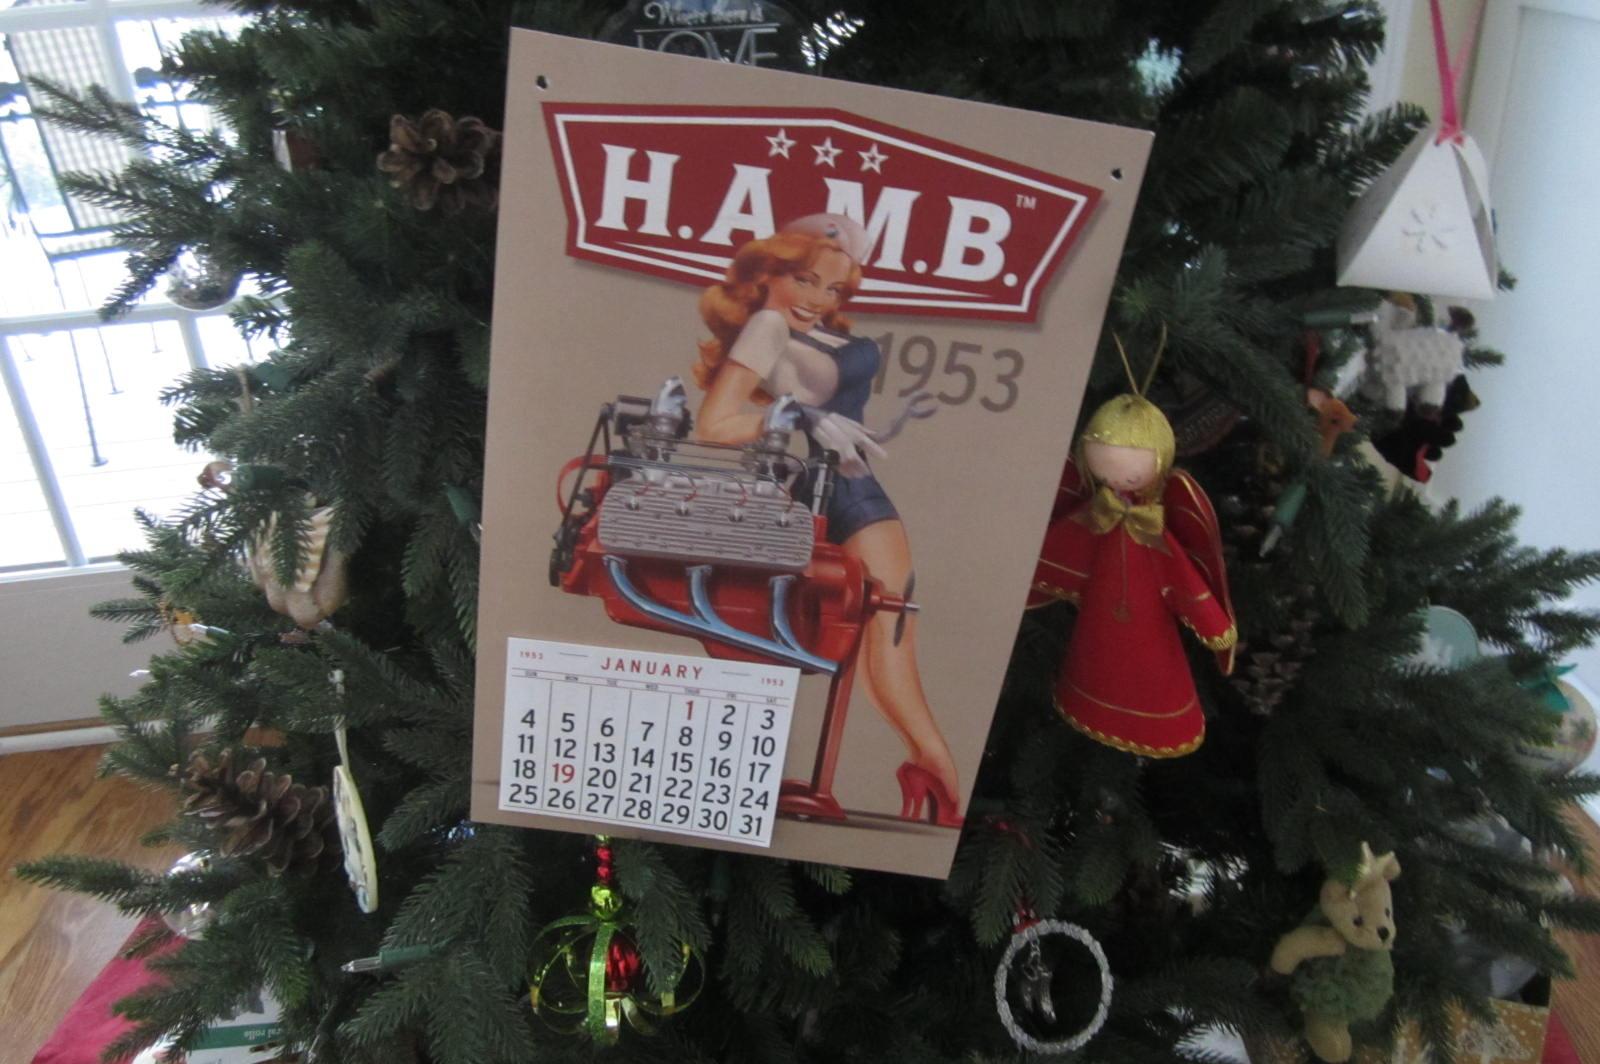 HAMB 1953 001.JPG